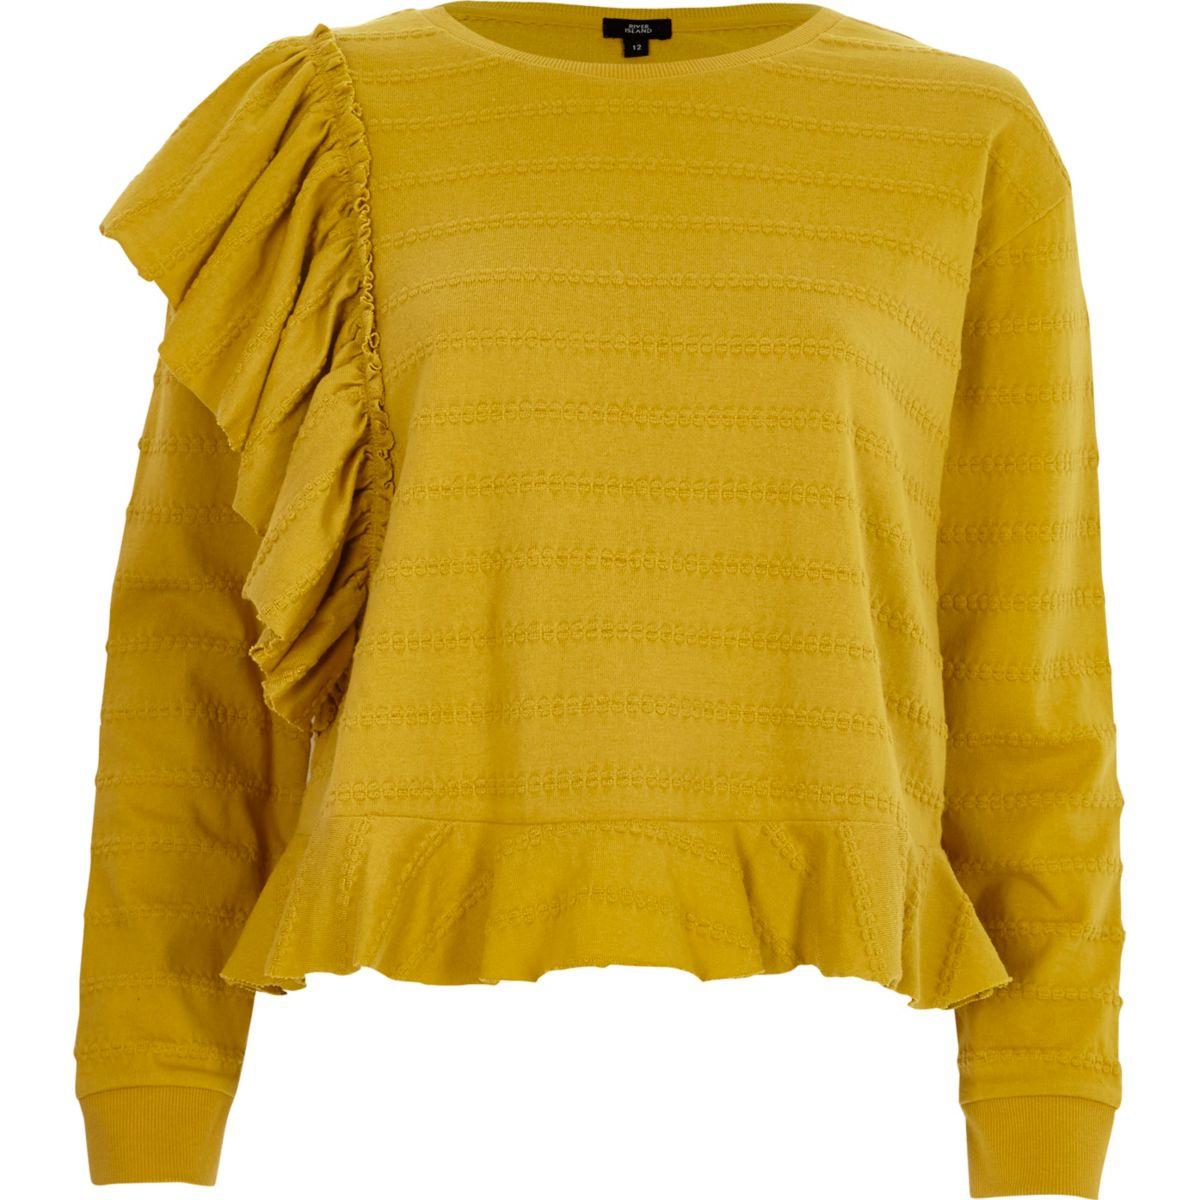 Yellow jacquard frill long sleeve top